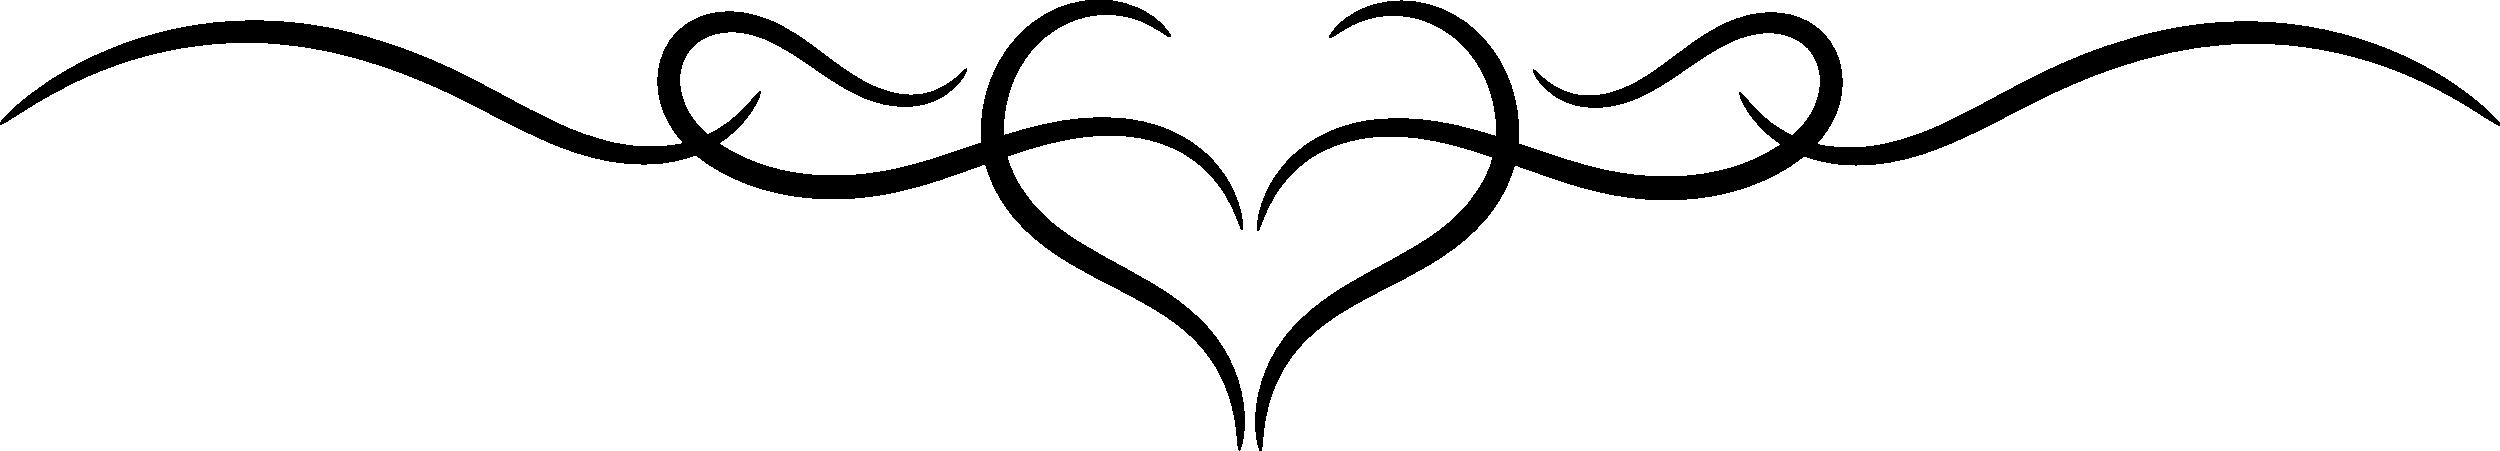 Divider PNG HD - 139009